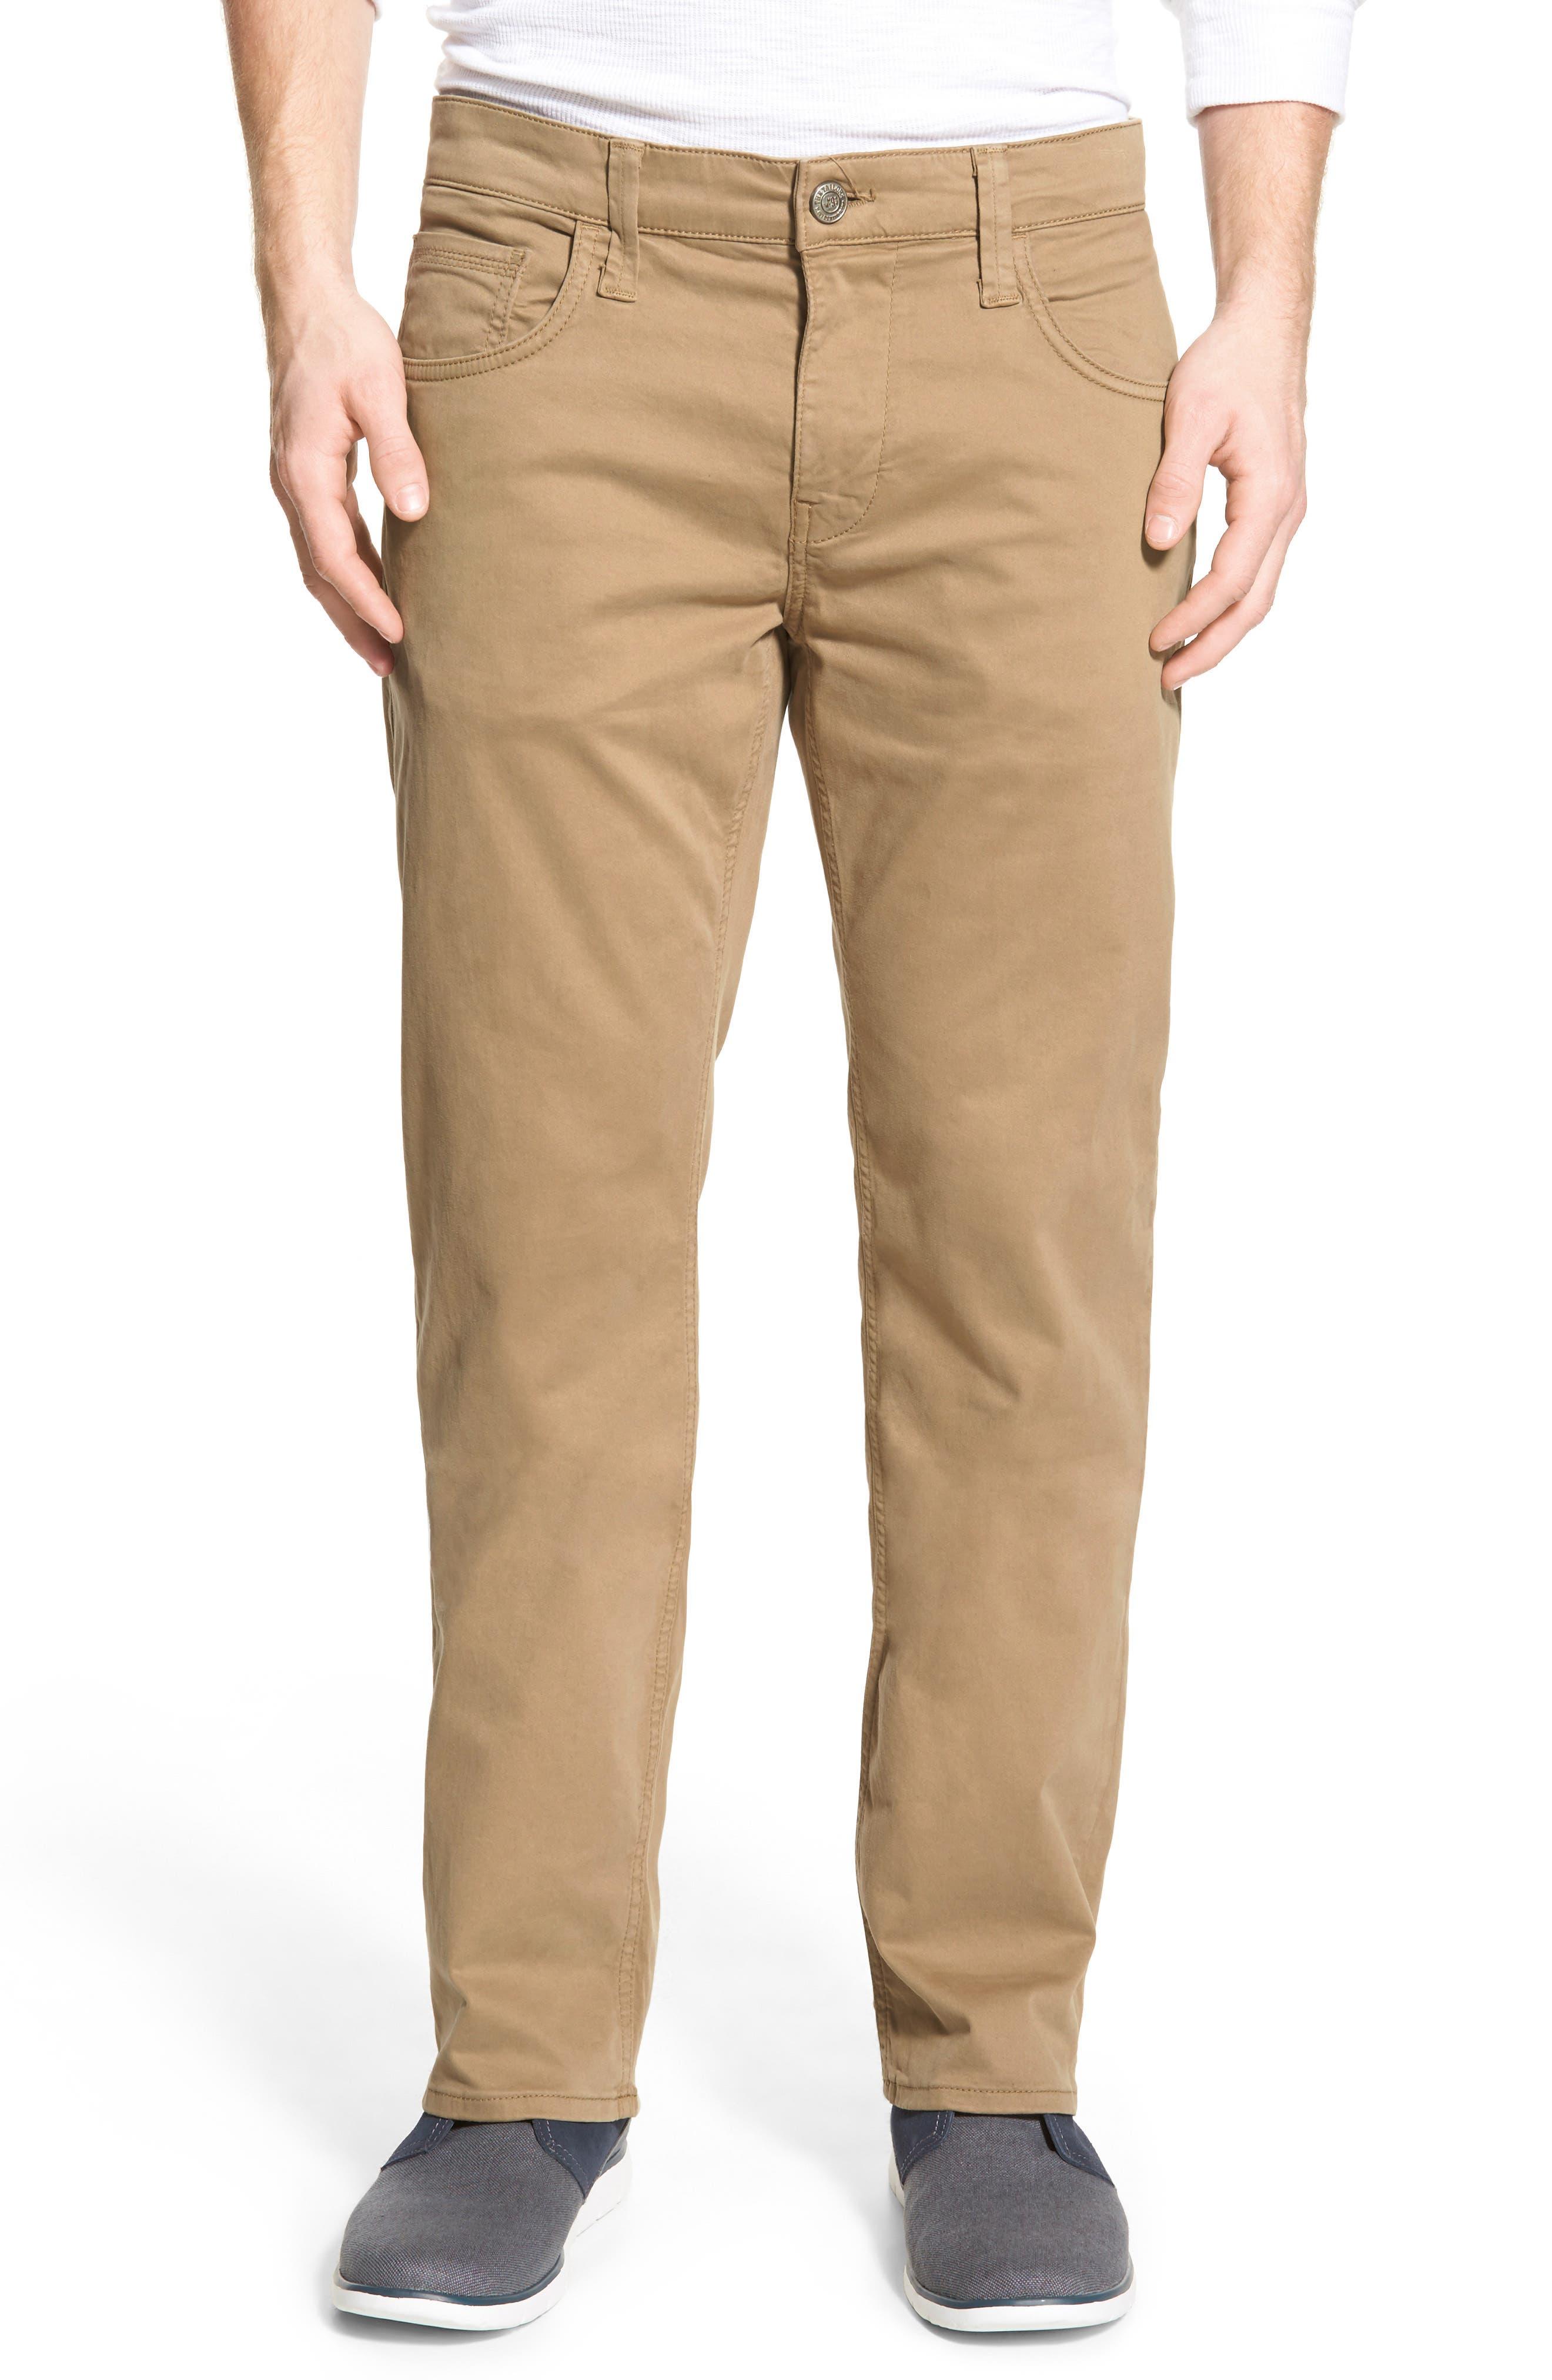 Zach Twill Pants,                         Main,                         color, Khaki